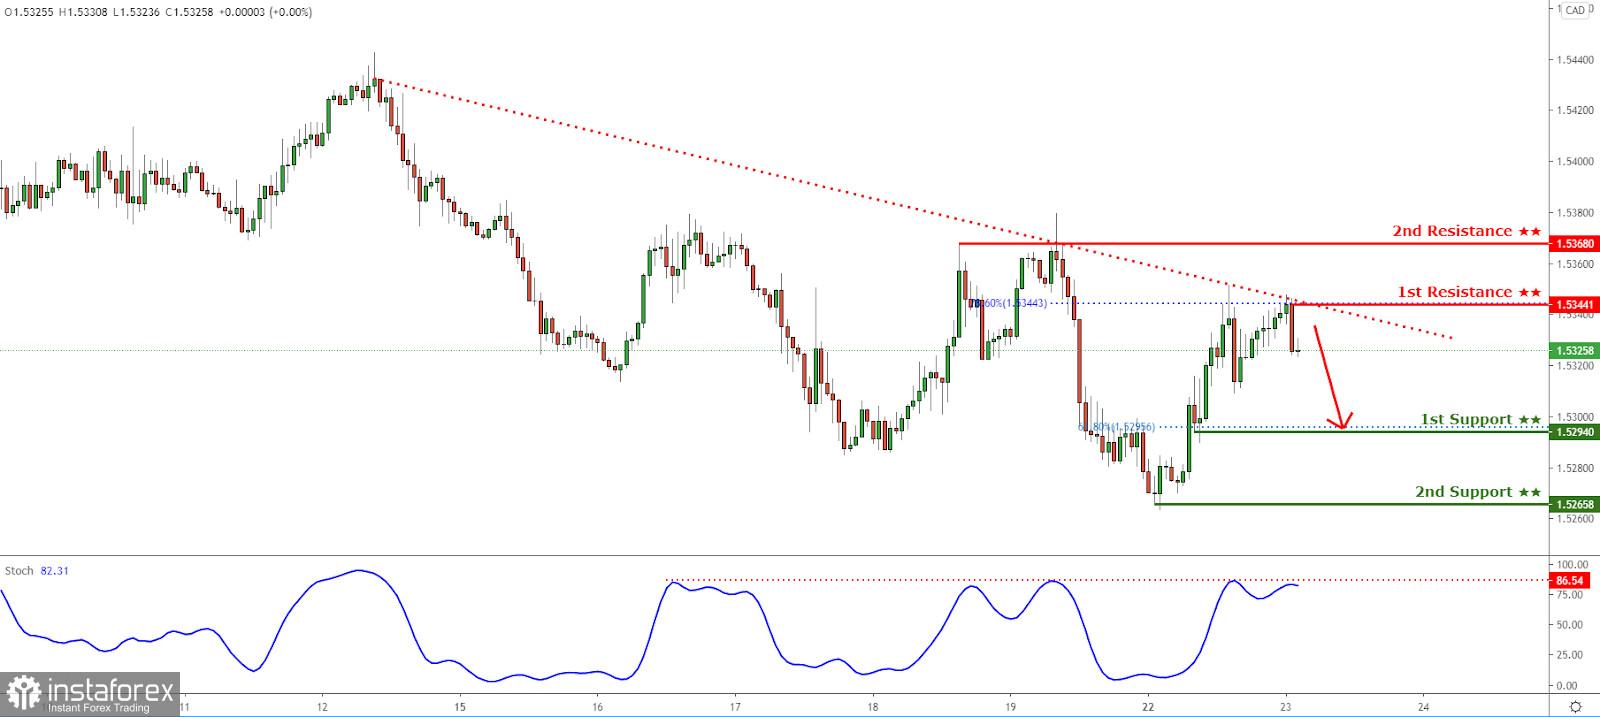 EURCAD holding below descending trendline resistance! Further drop incoming!